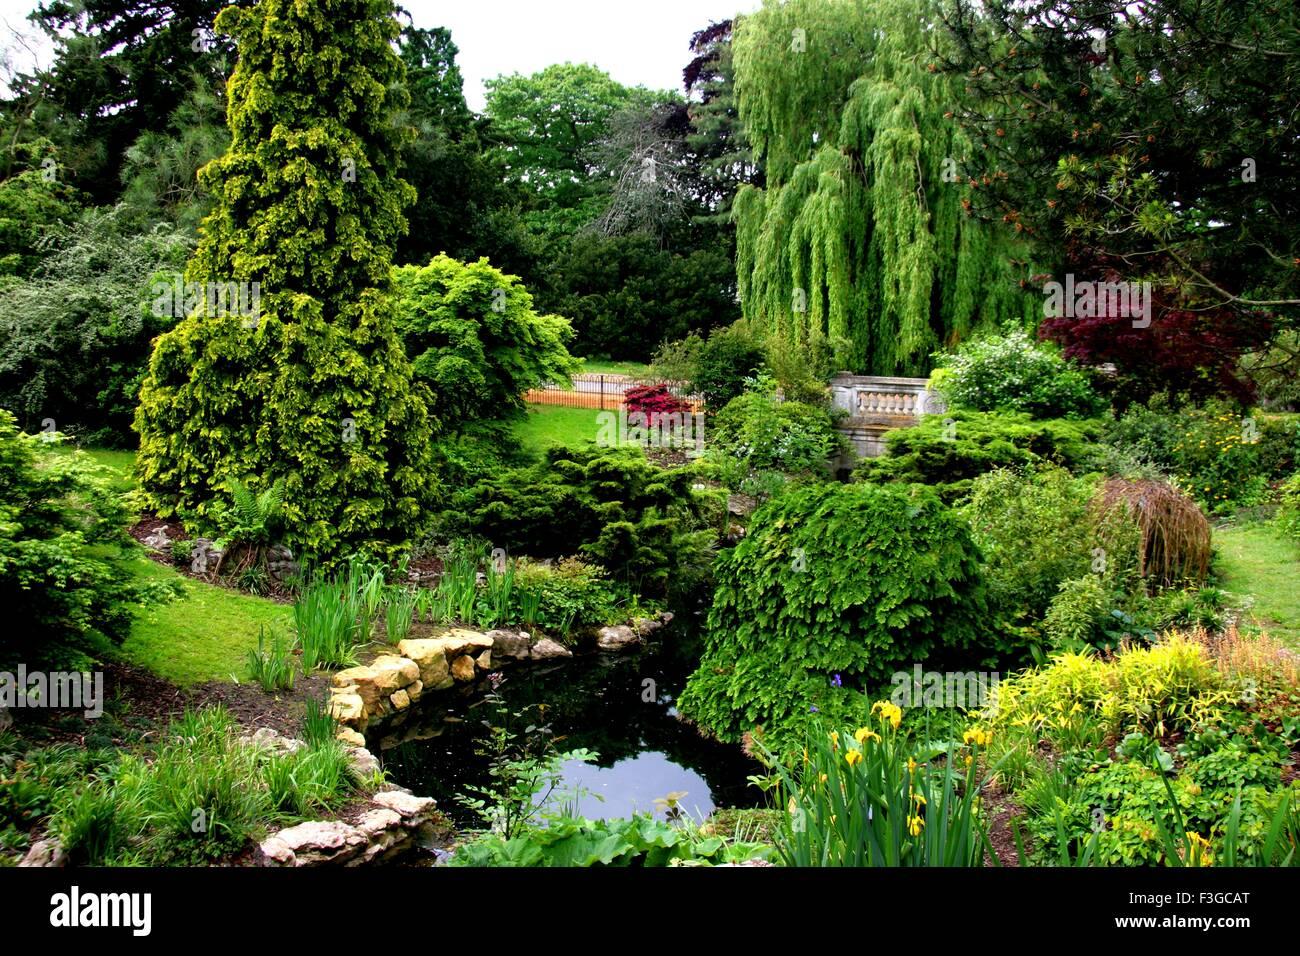 Agradable y peculiar paisaje inglés de Reino Unido Reino Unido Inglaterra Imagen De Stock